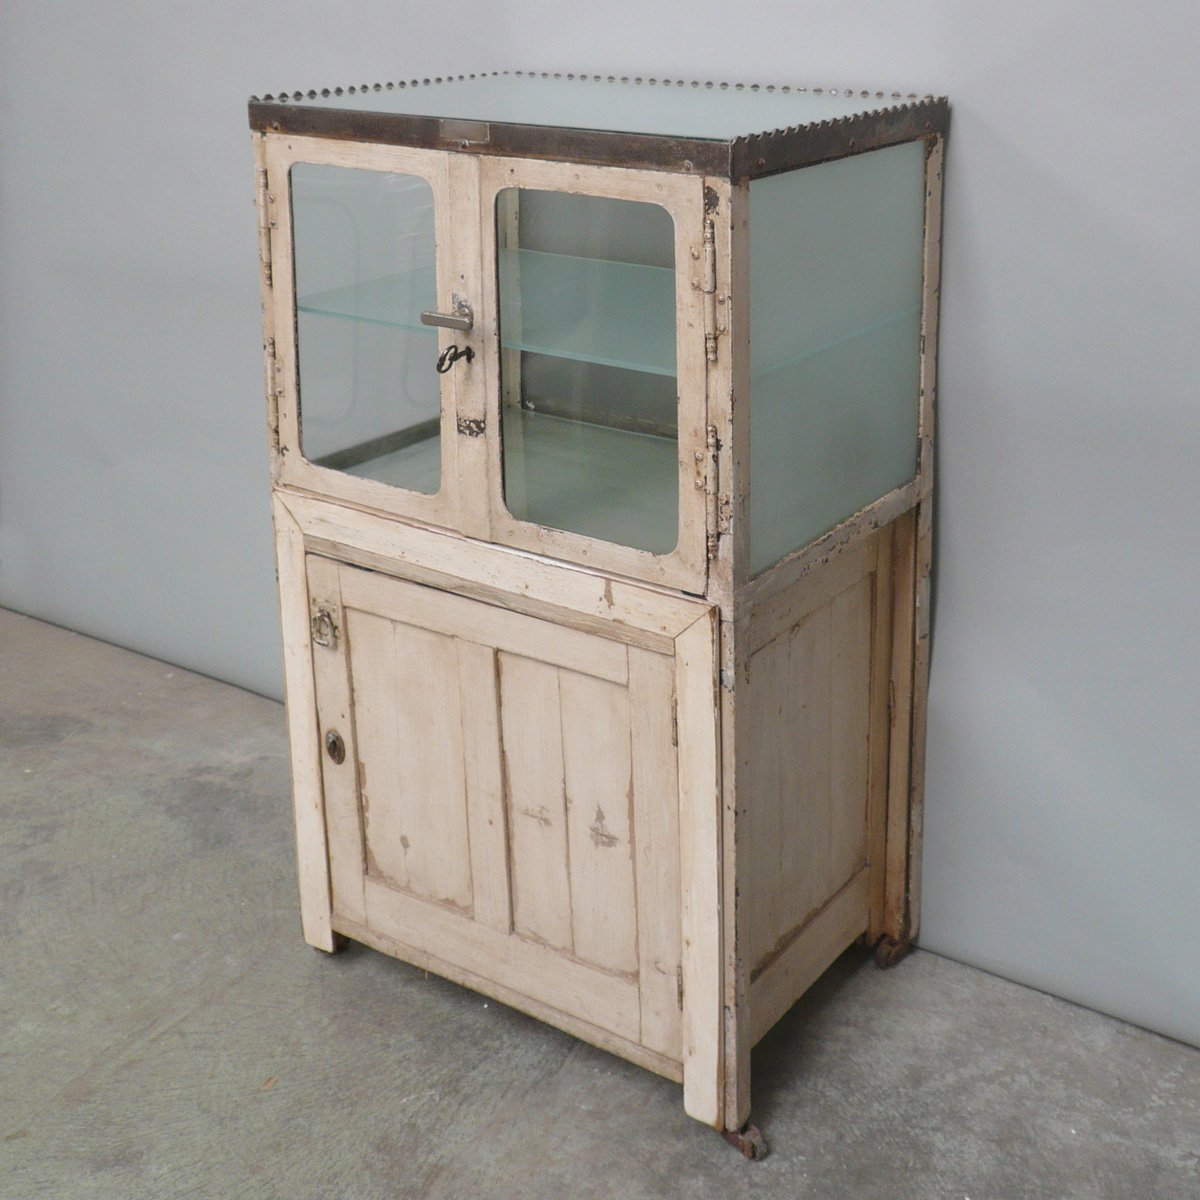 Medizinschrank Vintage: Vital vintage first aid cabinet in steel ...